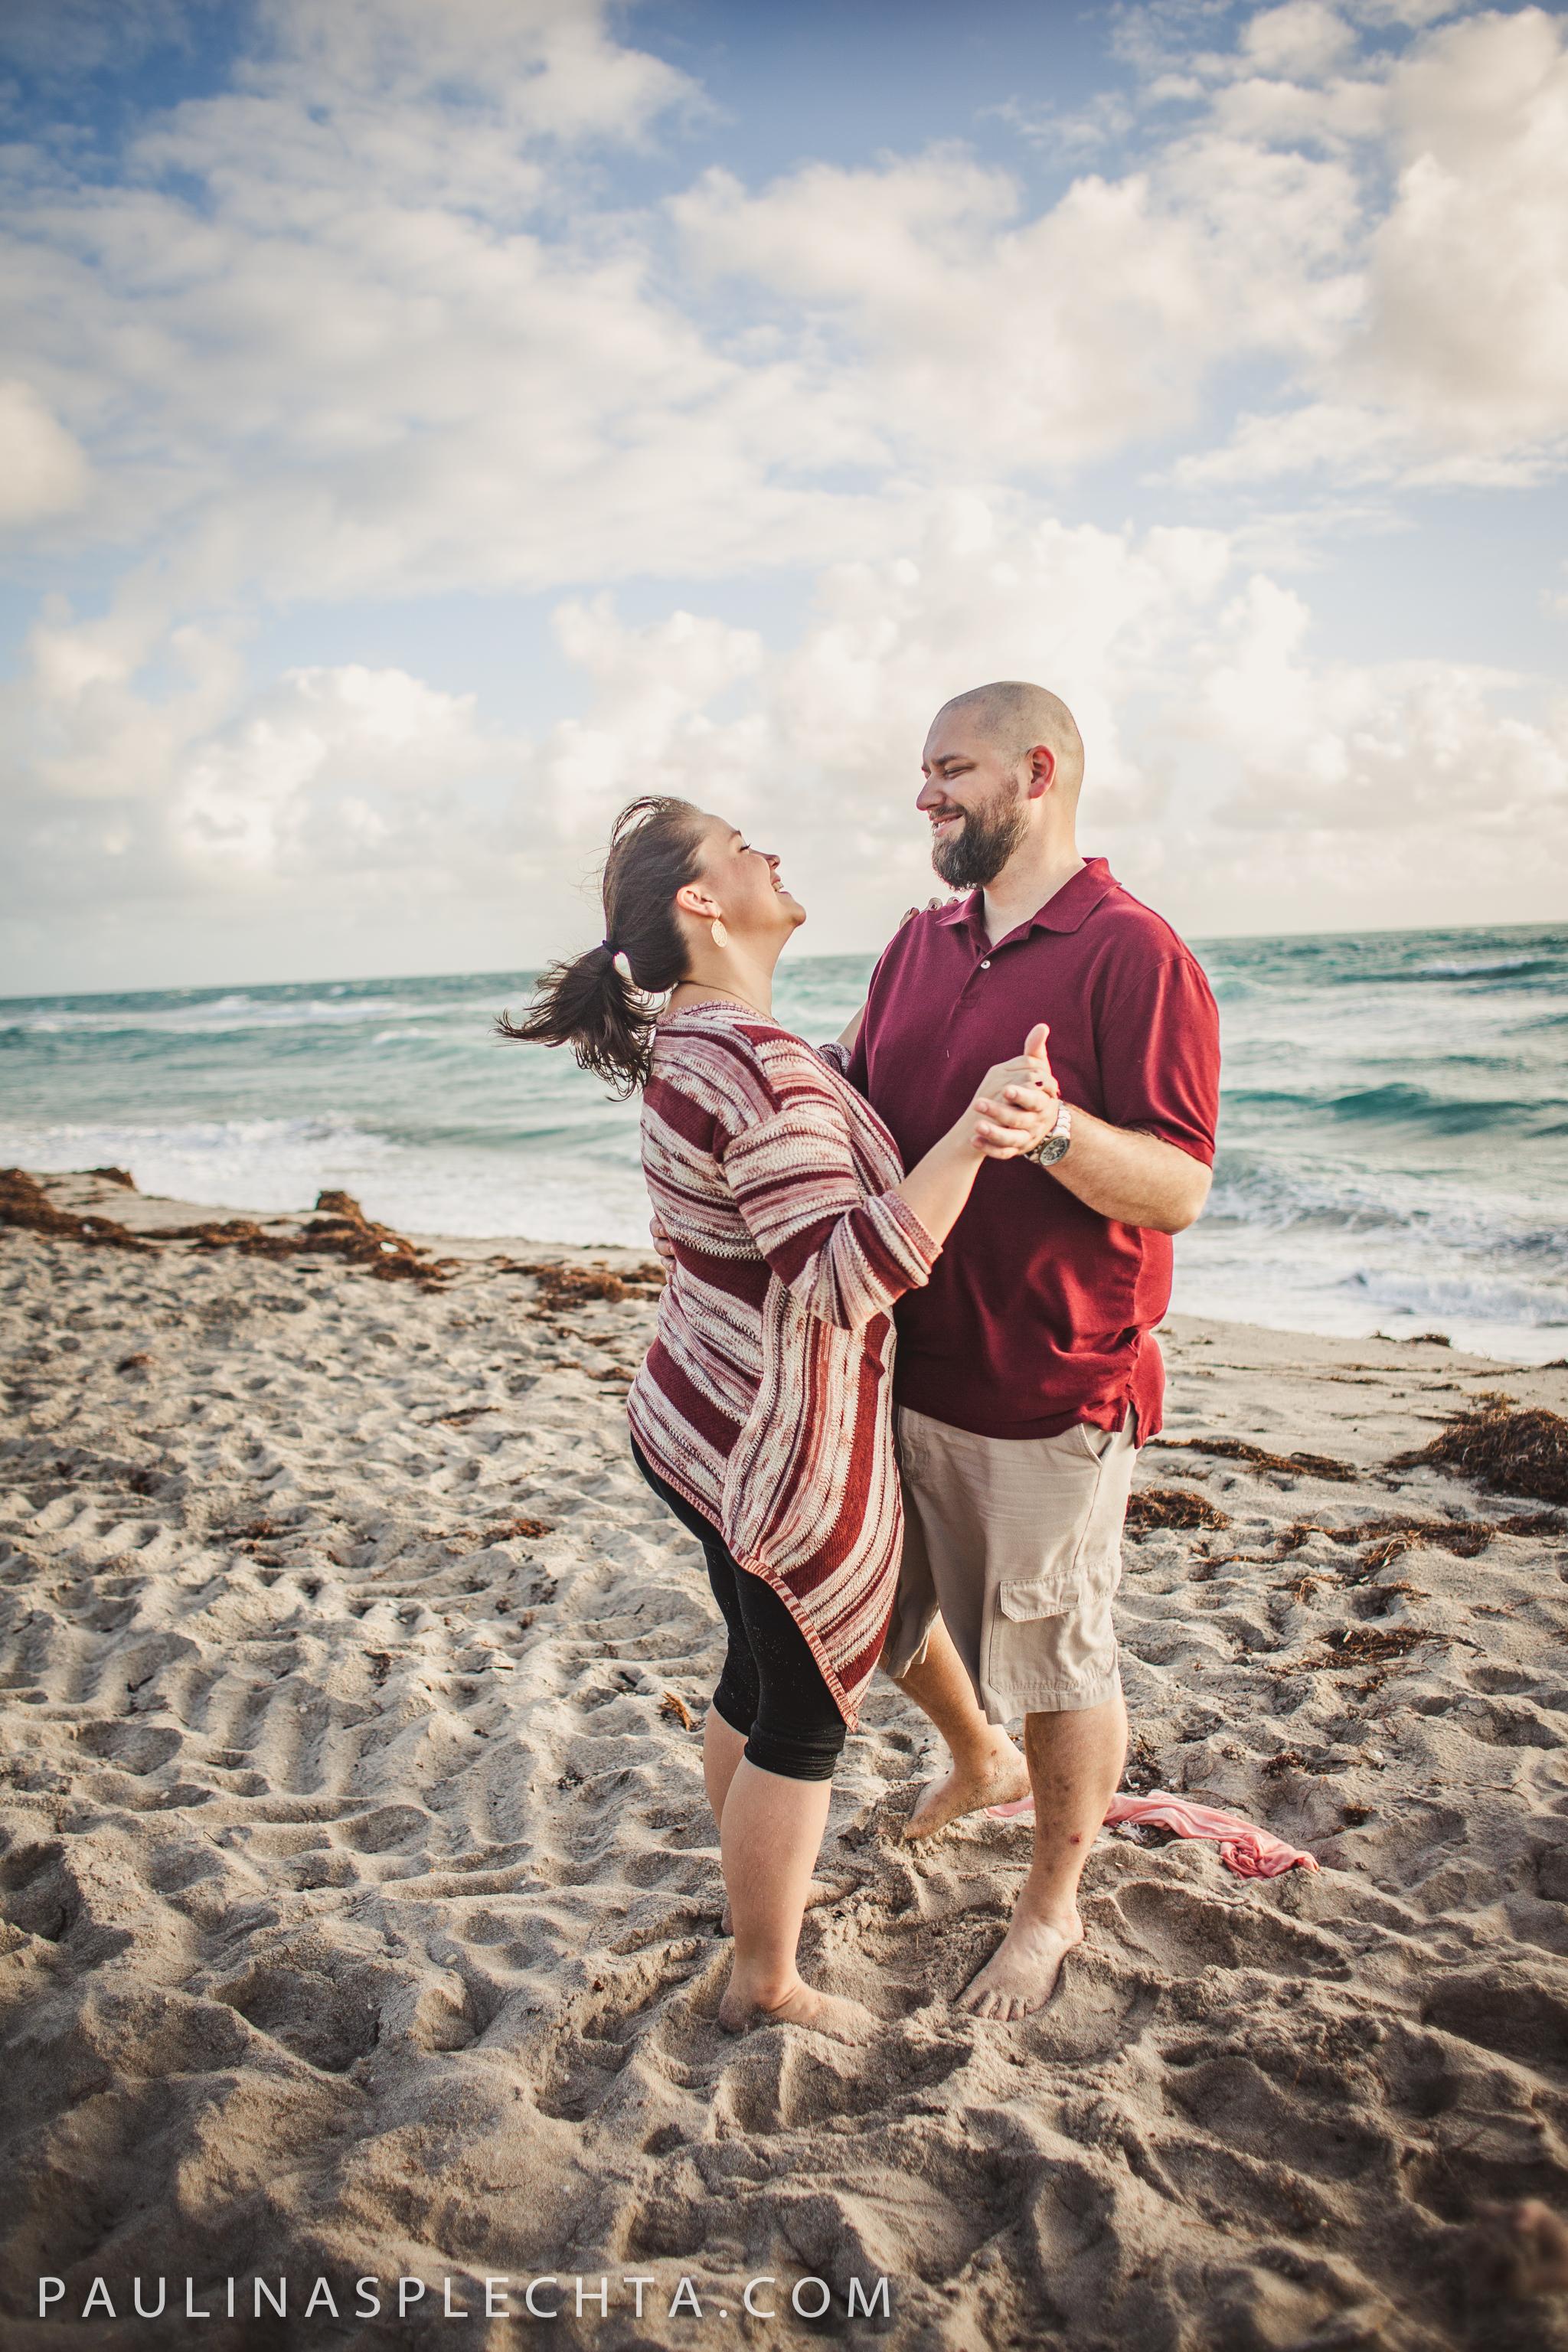 Family Photographer South Florida Pompano Broward Palm Beach Babies Baby Newborn Breastfeeding Birth Photograpy Beach Home Documentary Session-144.jpg